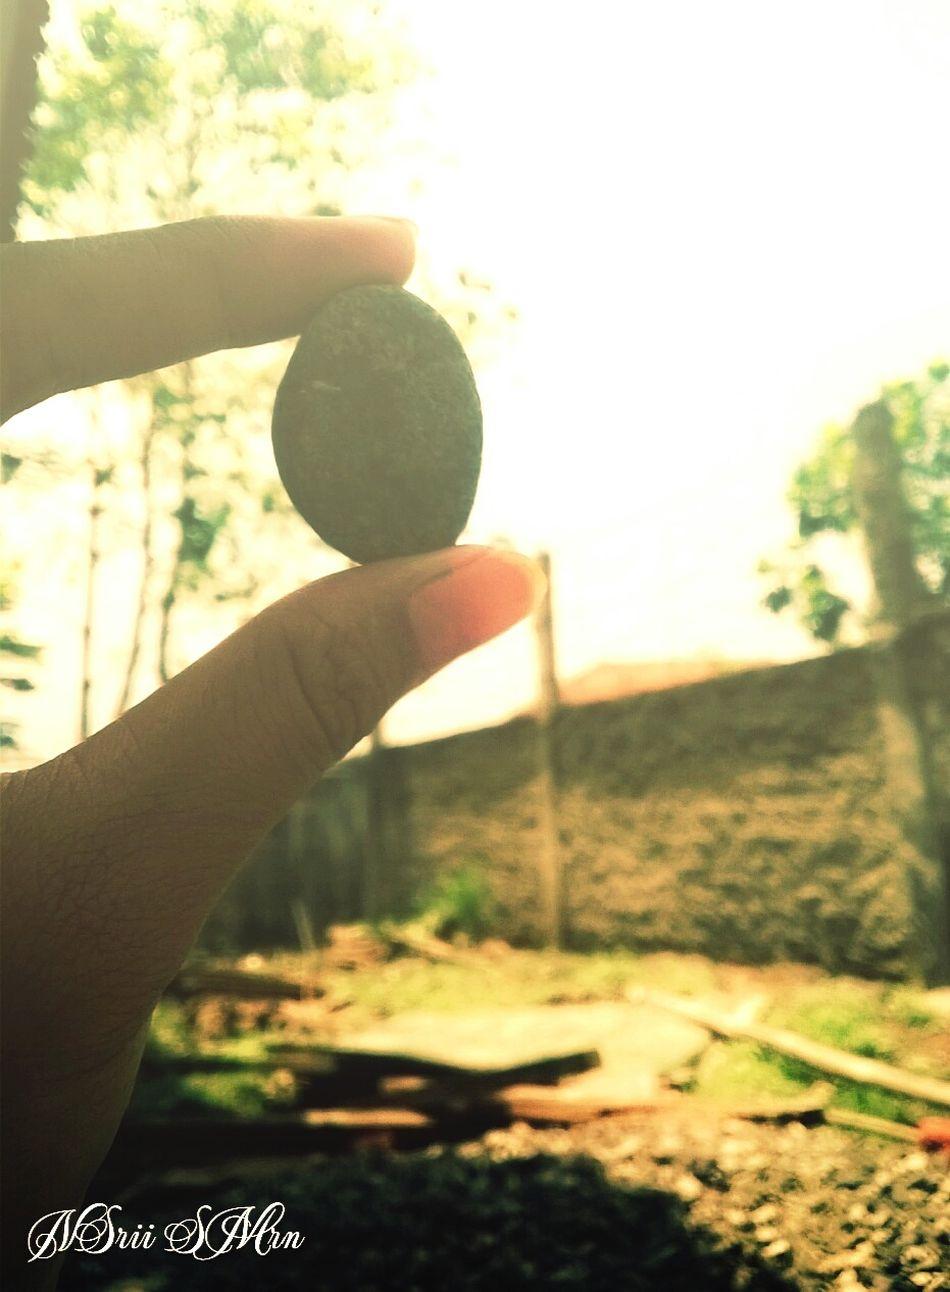 Nsrii_smrn Fhotografy Eyeemindonesia EyeEm Thankyou Thanks4thefollow Thanksforfollowing Thanksforlike Gdnights